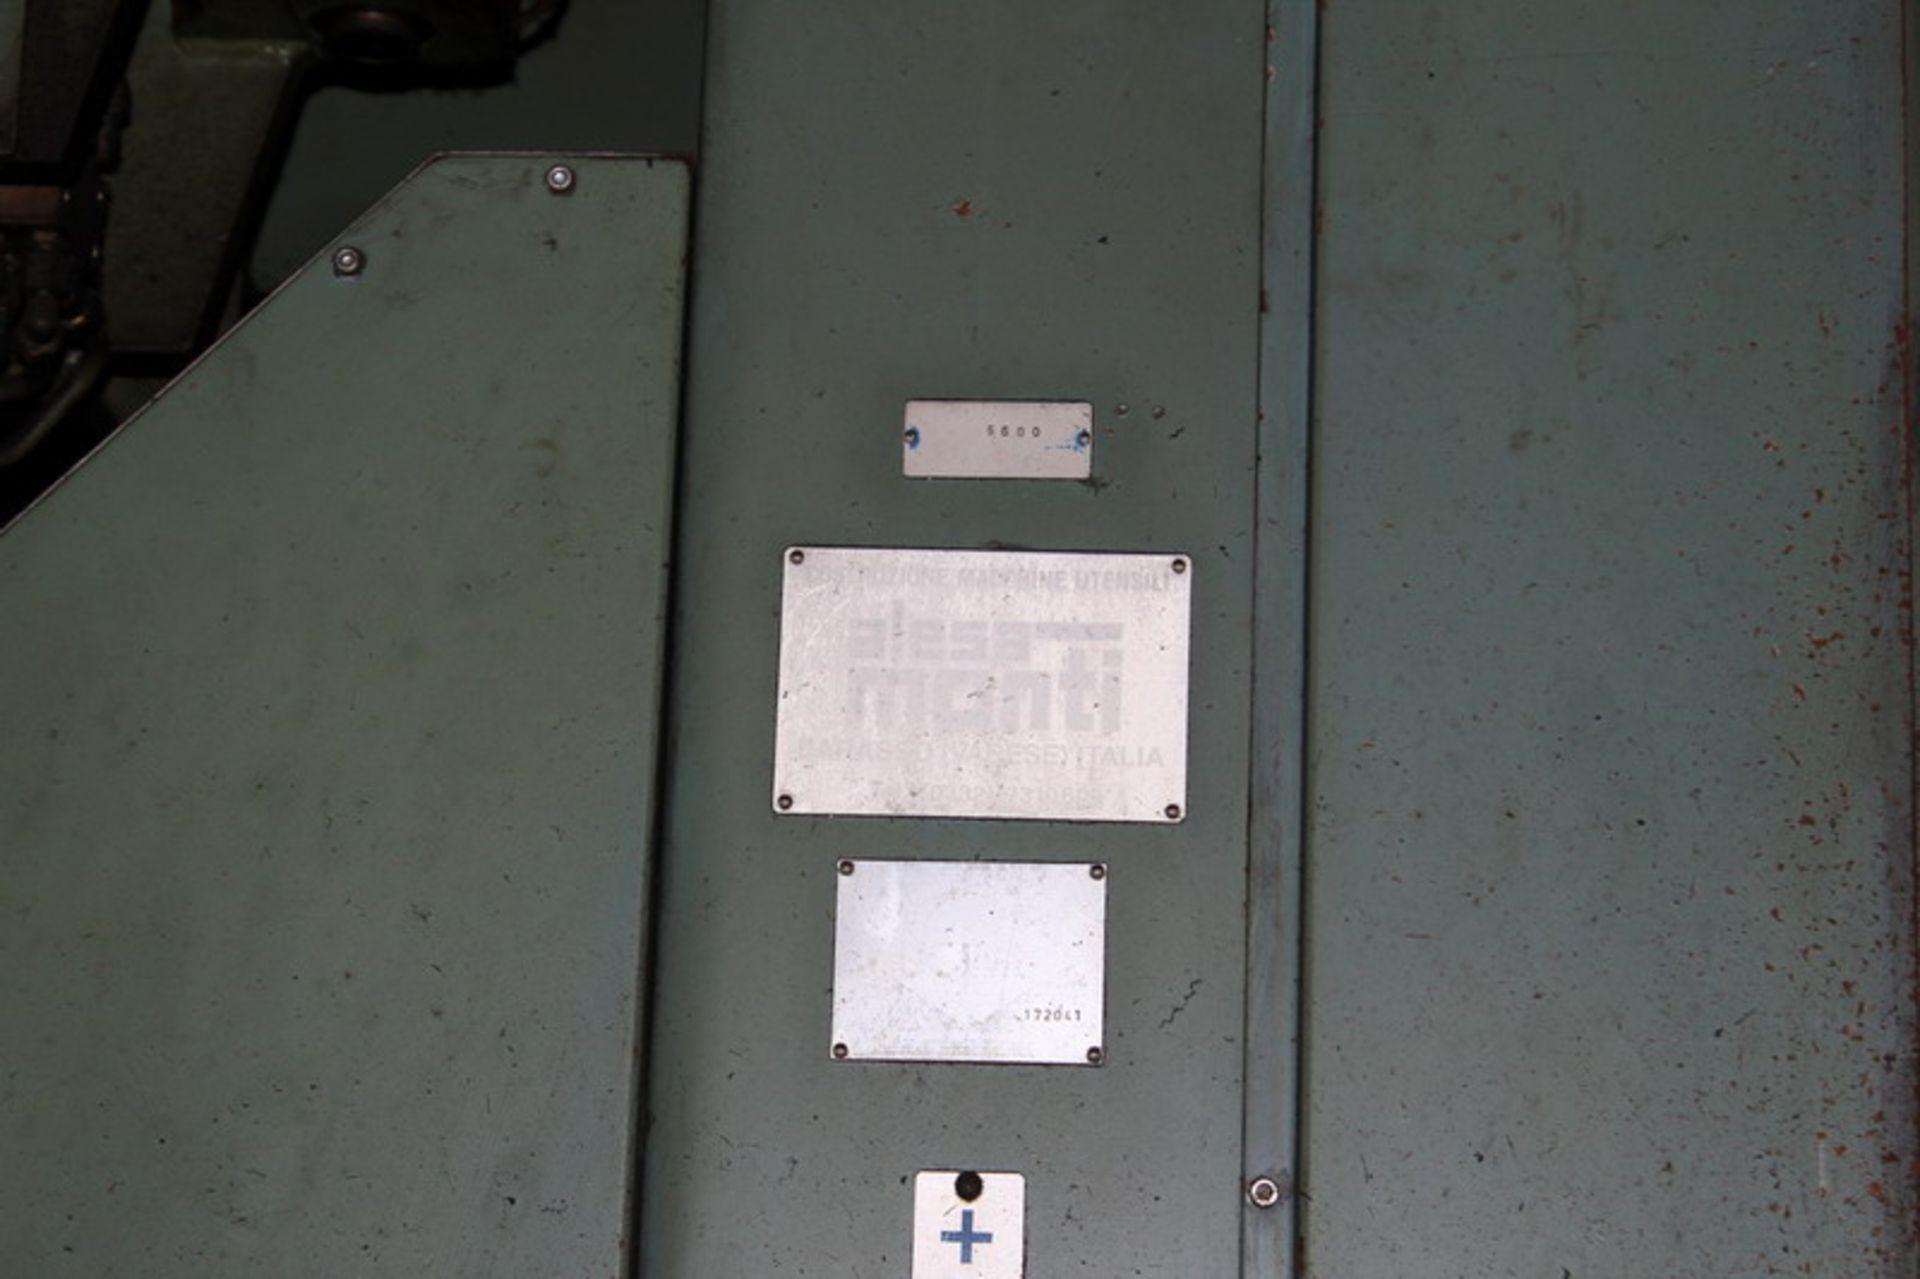 Lot 58 - N. 2 (N. 725 IVG FALLIMENTO) FRESATRICE ALESAMONTI M.15, N. 172041, NON RINVENUTA LA TARGHETTA E 54